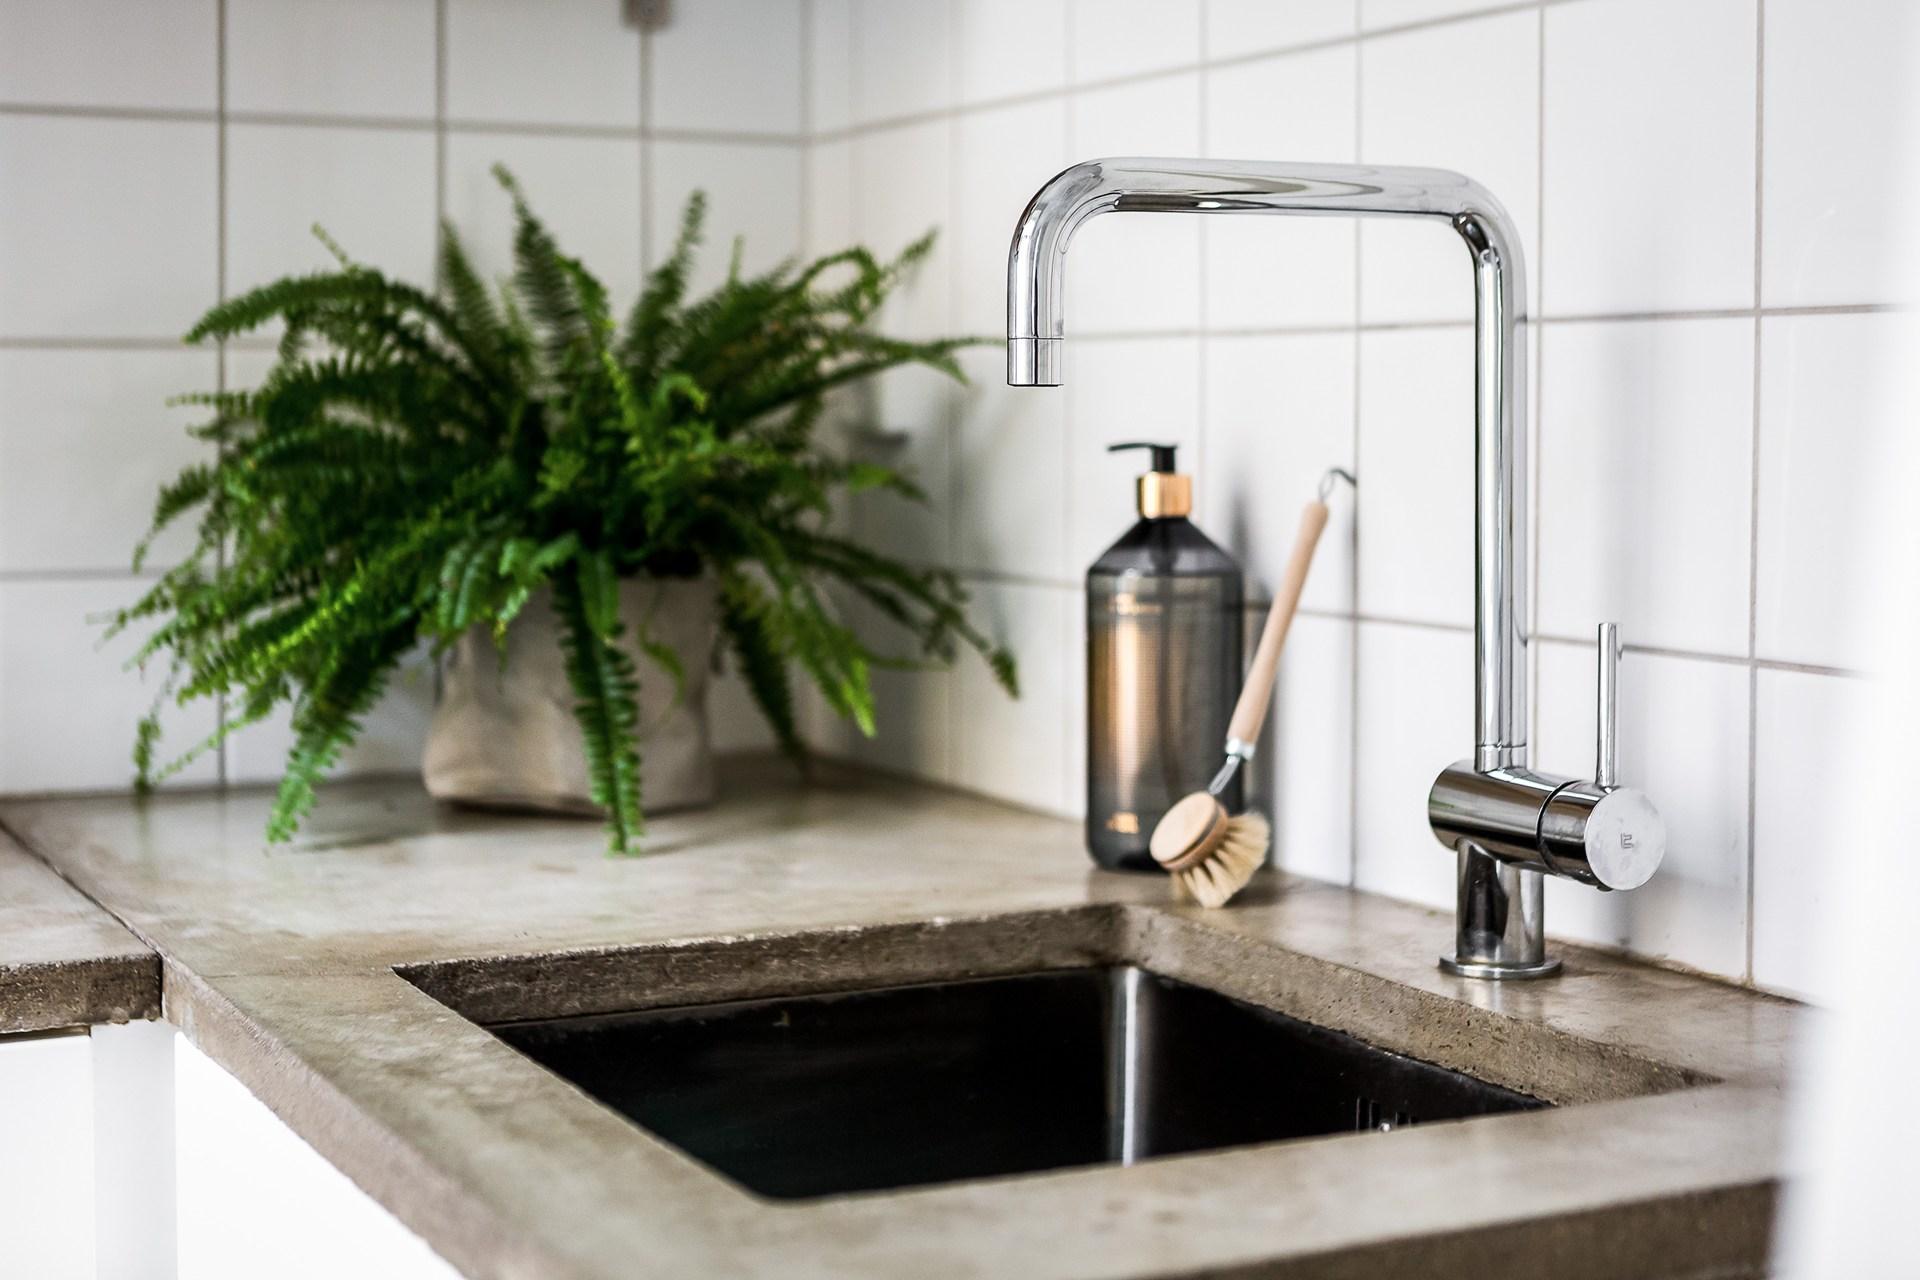 кухня столешница бетон мойка смеситель цветок